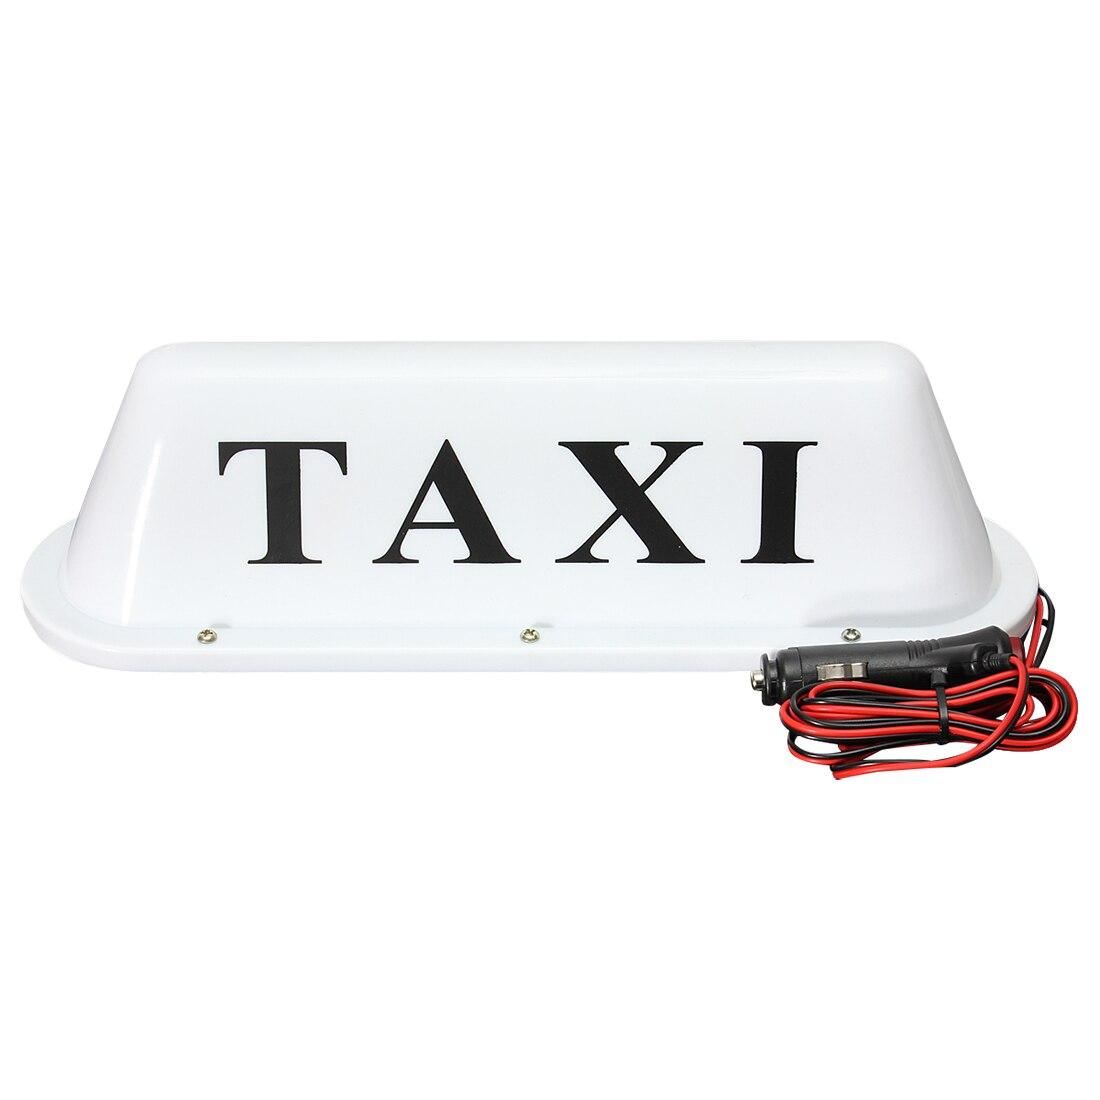 White Waterproof Taxi Magnetic Base Roof Top Car Cab LED Sign Light Lamp 12V PVC 1pcs taxi libre lamp leds license plate car light windscreen cab indicator inside led taxi light in led sign car taxi for bmw cj